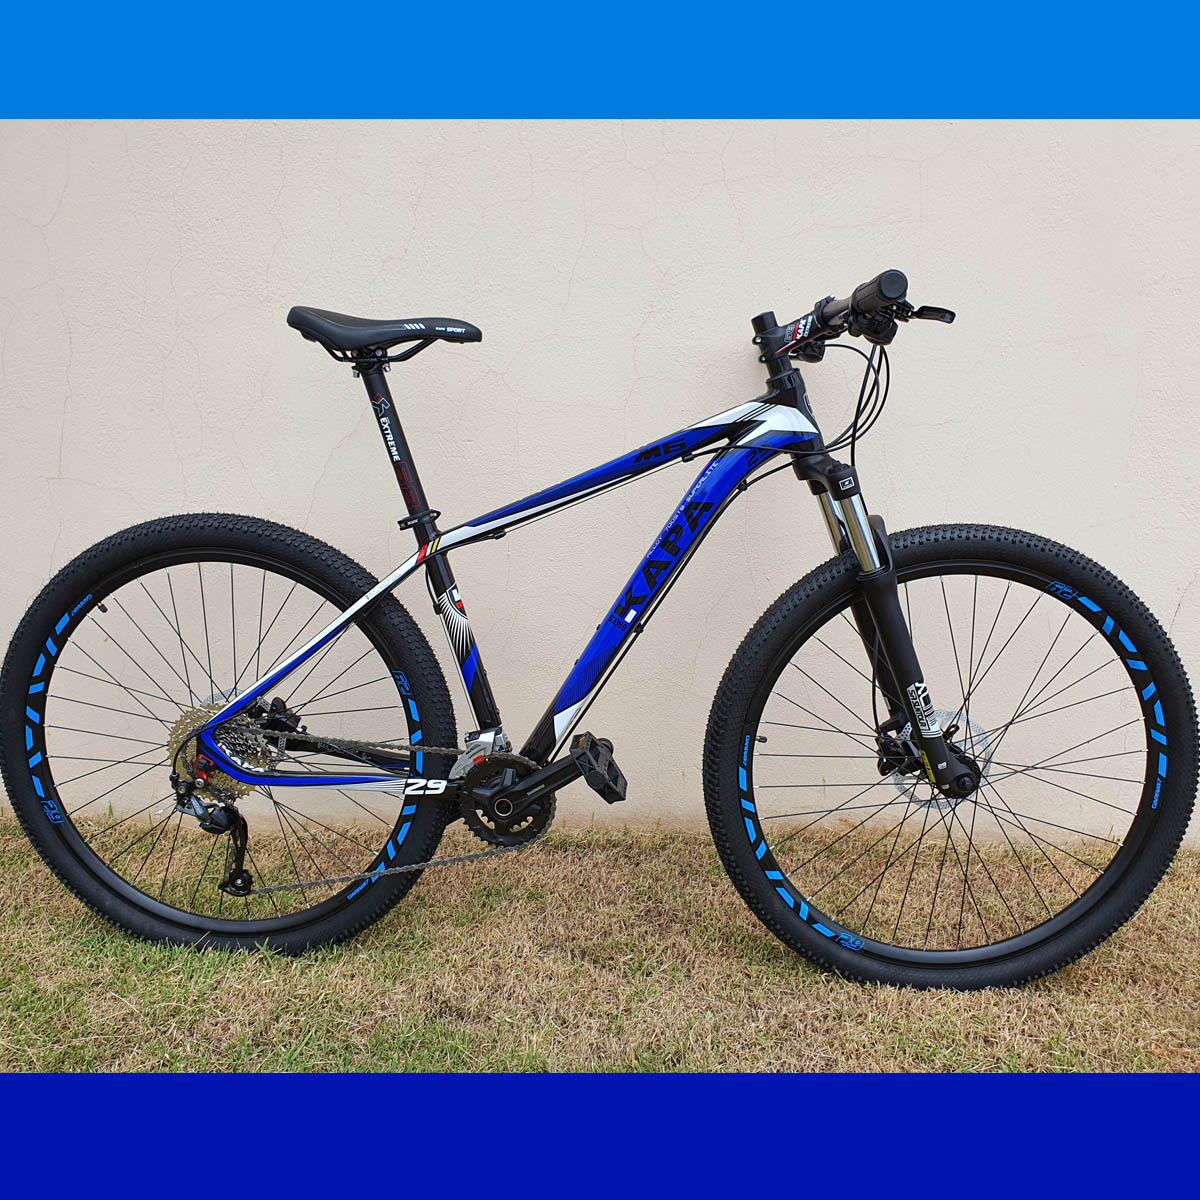 Bicicleta 29 KAPA M6 2x9 Shimano Altus 17.5 Azul